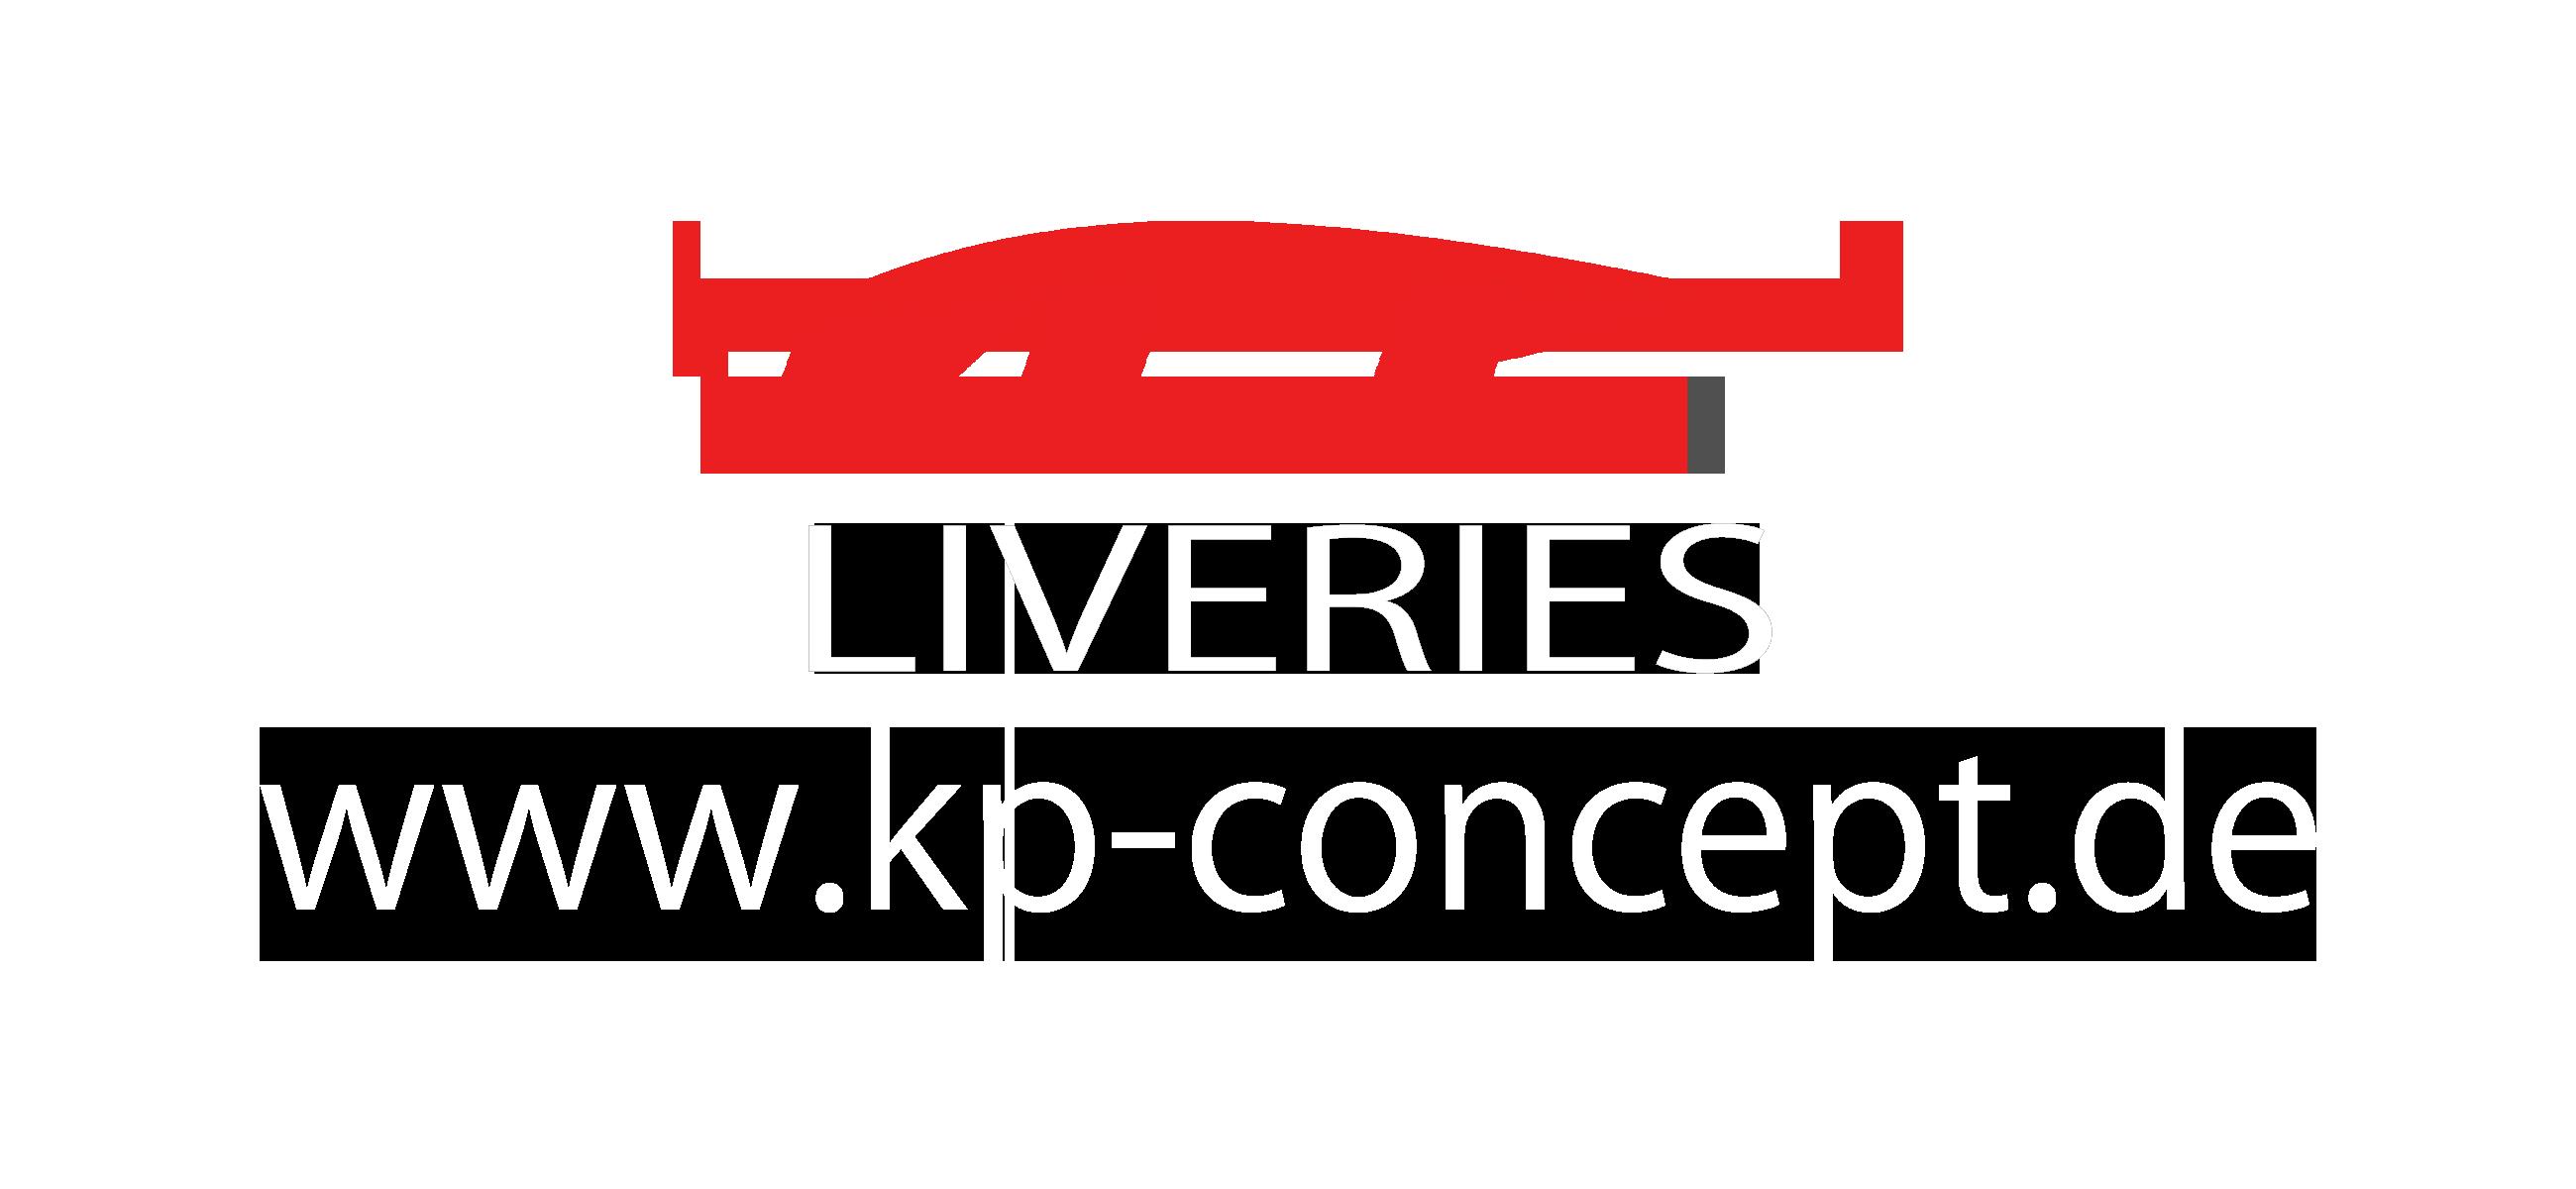 KP-CONCEPT